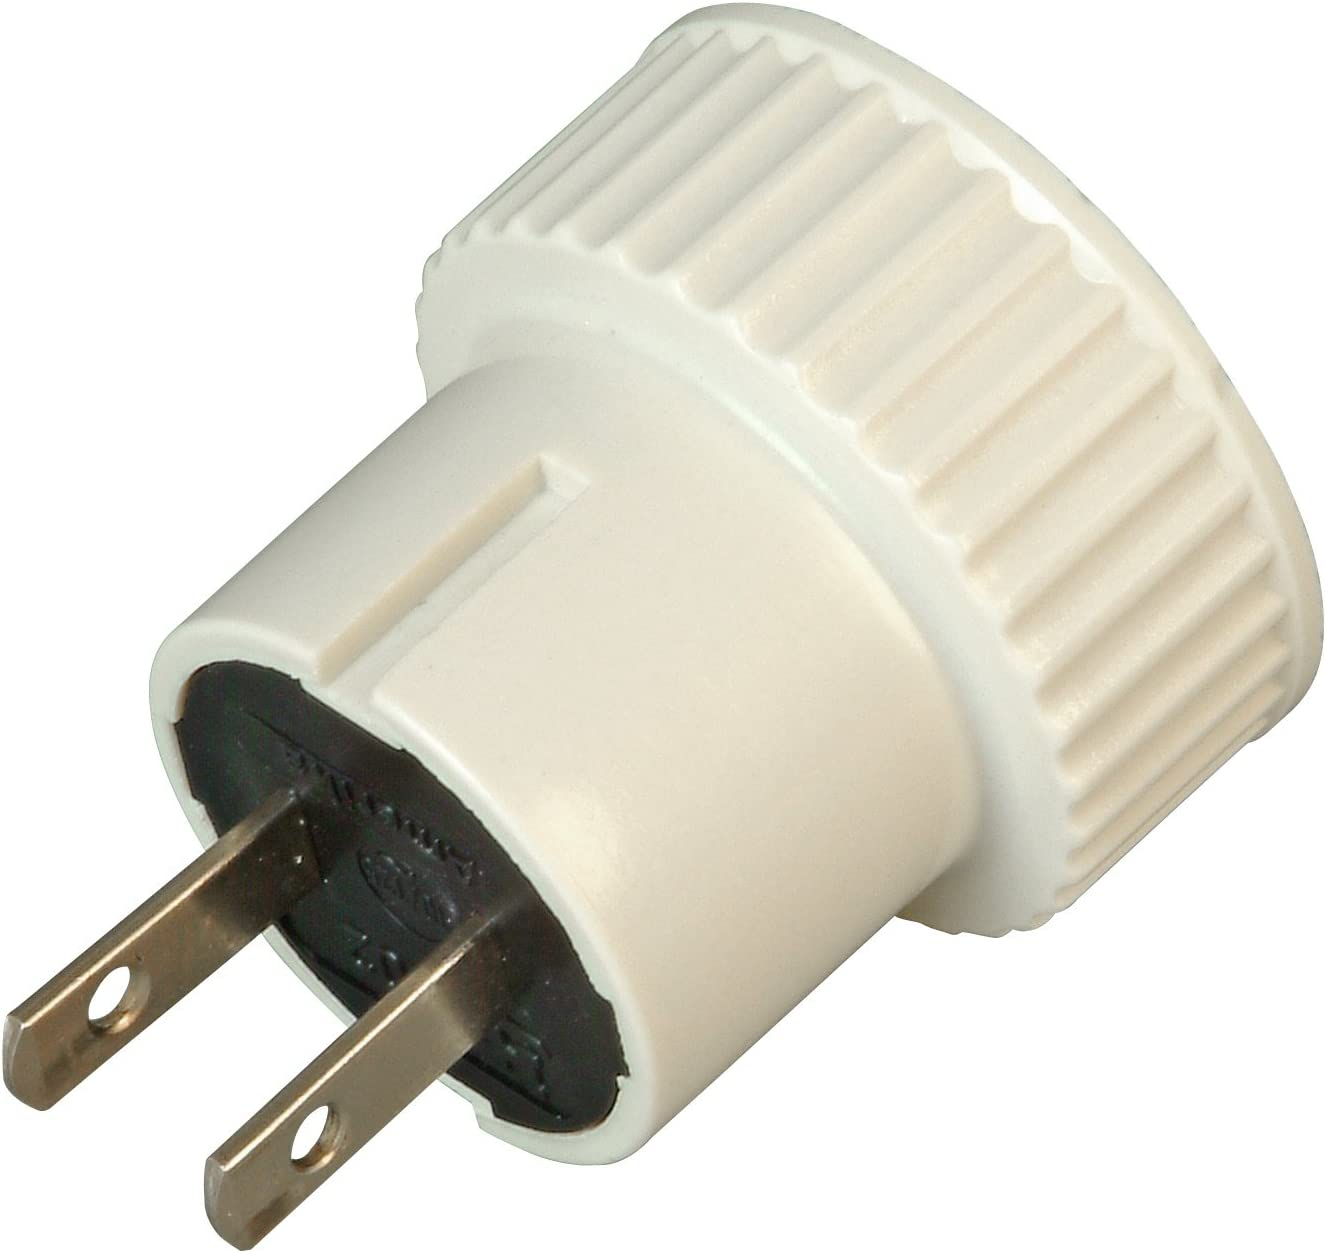 Kopp 176301084 Reise-Stecker-Adapter f/ür Nordamerika